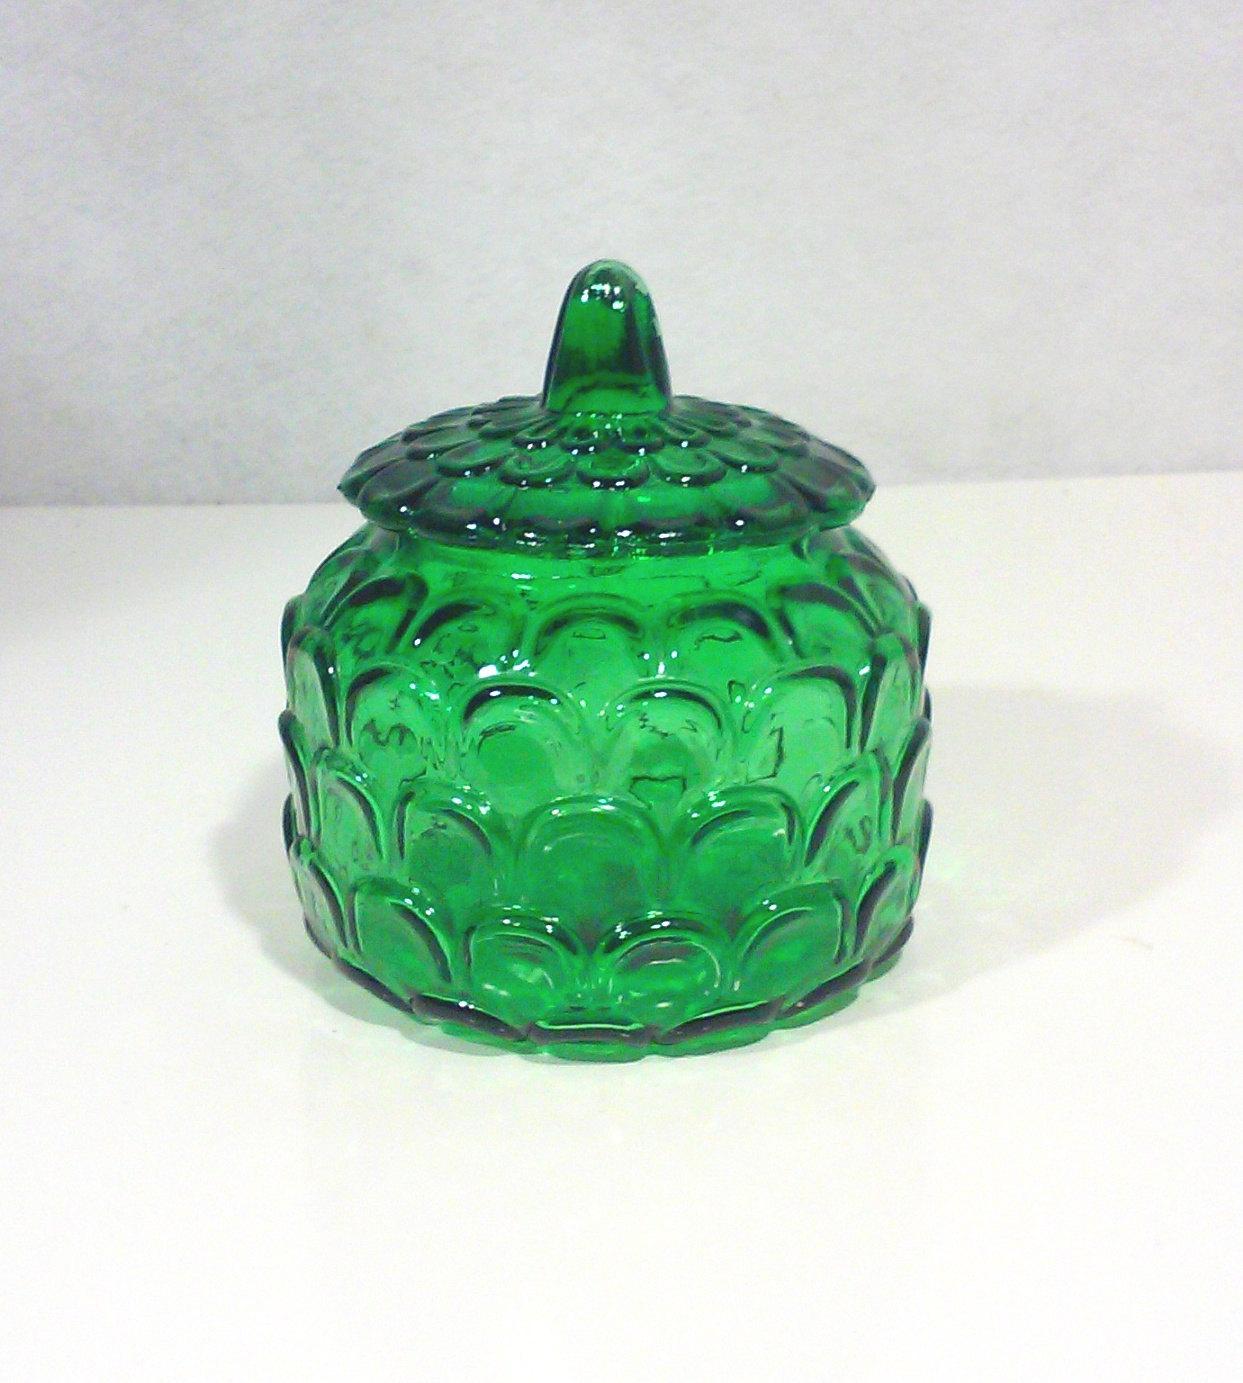 Vintage Italian Emerald Green Glass Lidded Jar